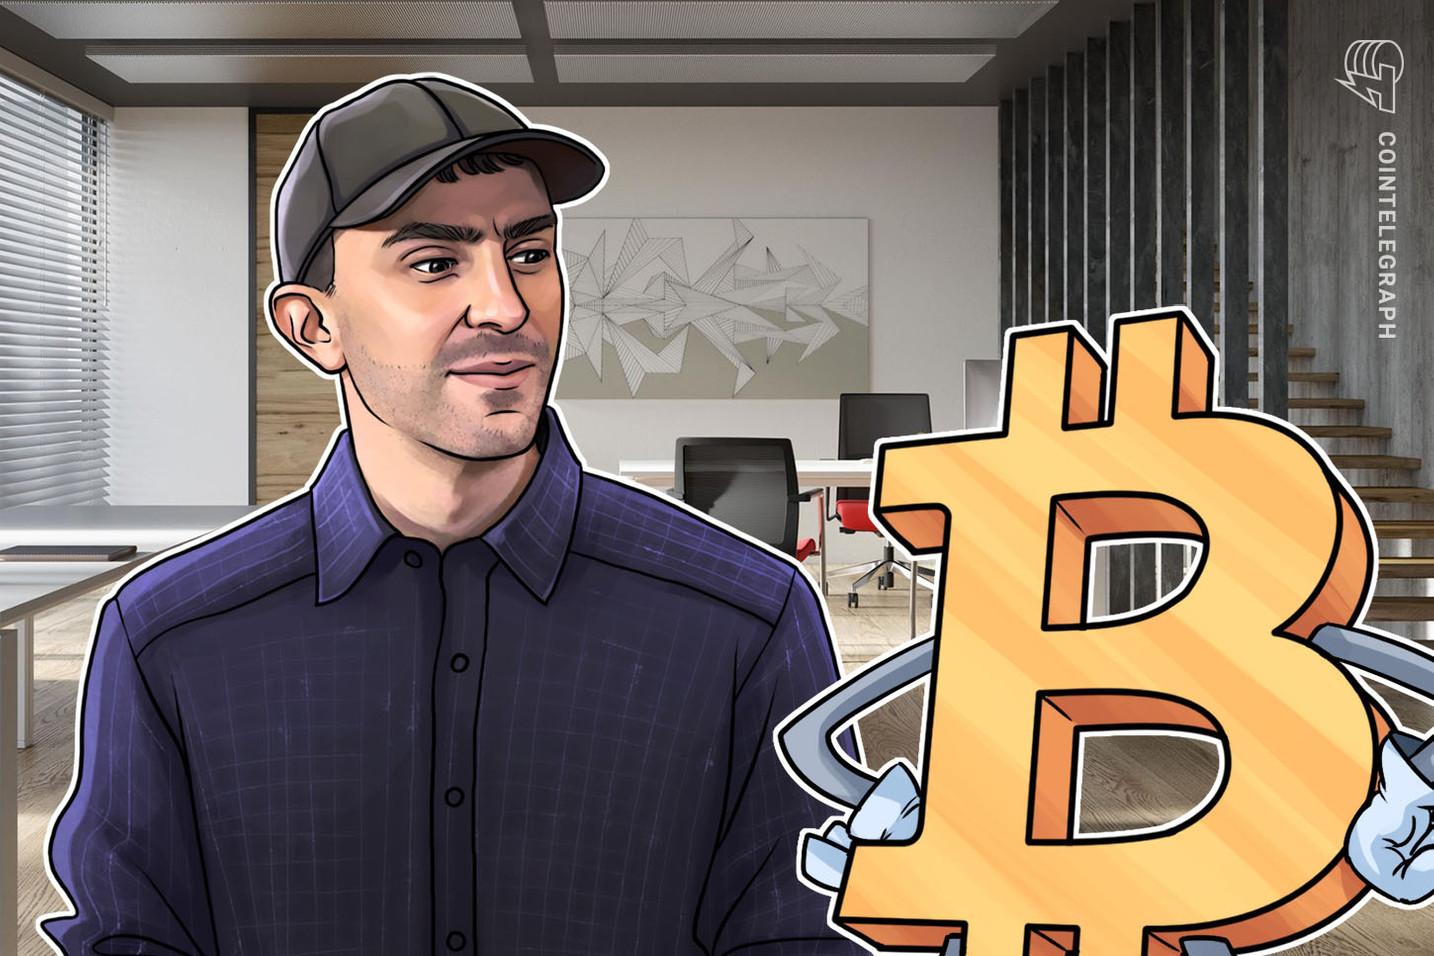 Tone Vays: Bitcoin Price Won't Leave $6K–$10K Range Until 2021